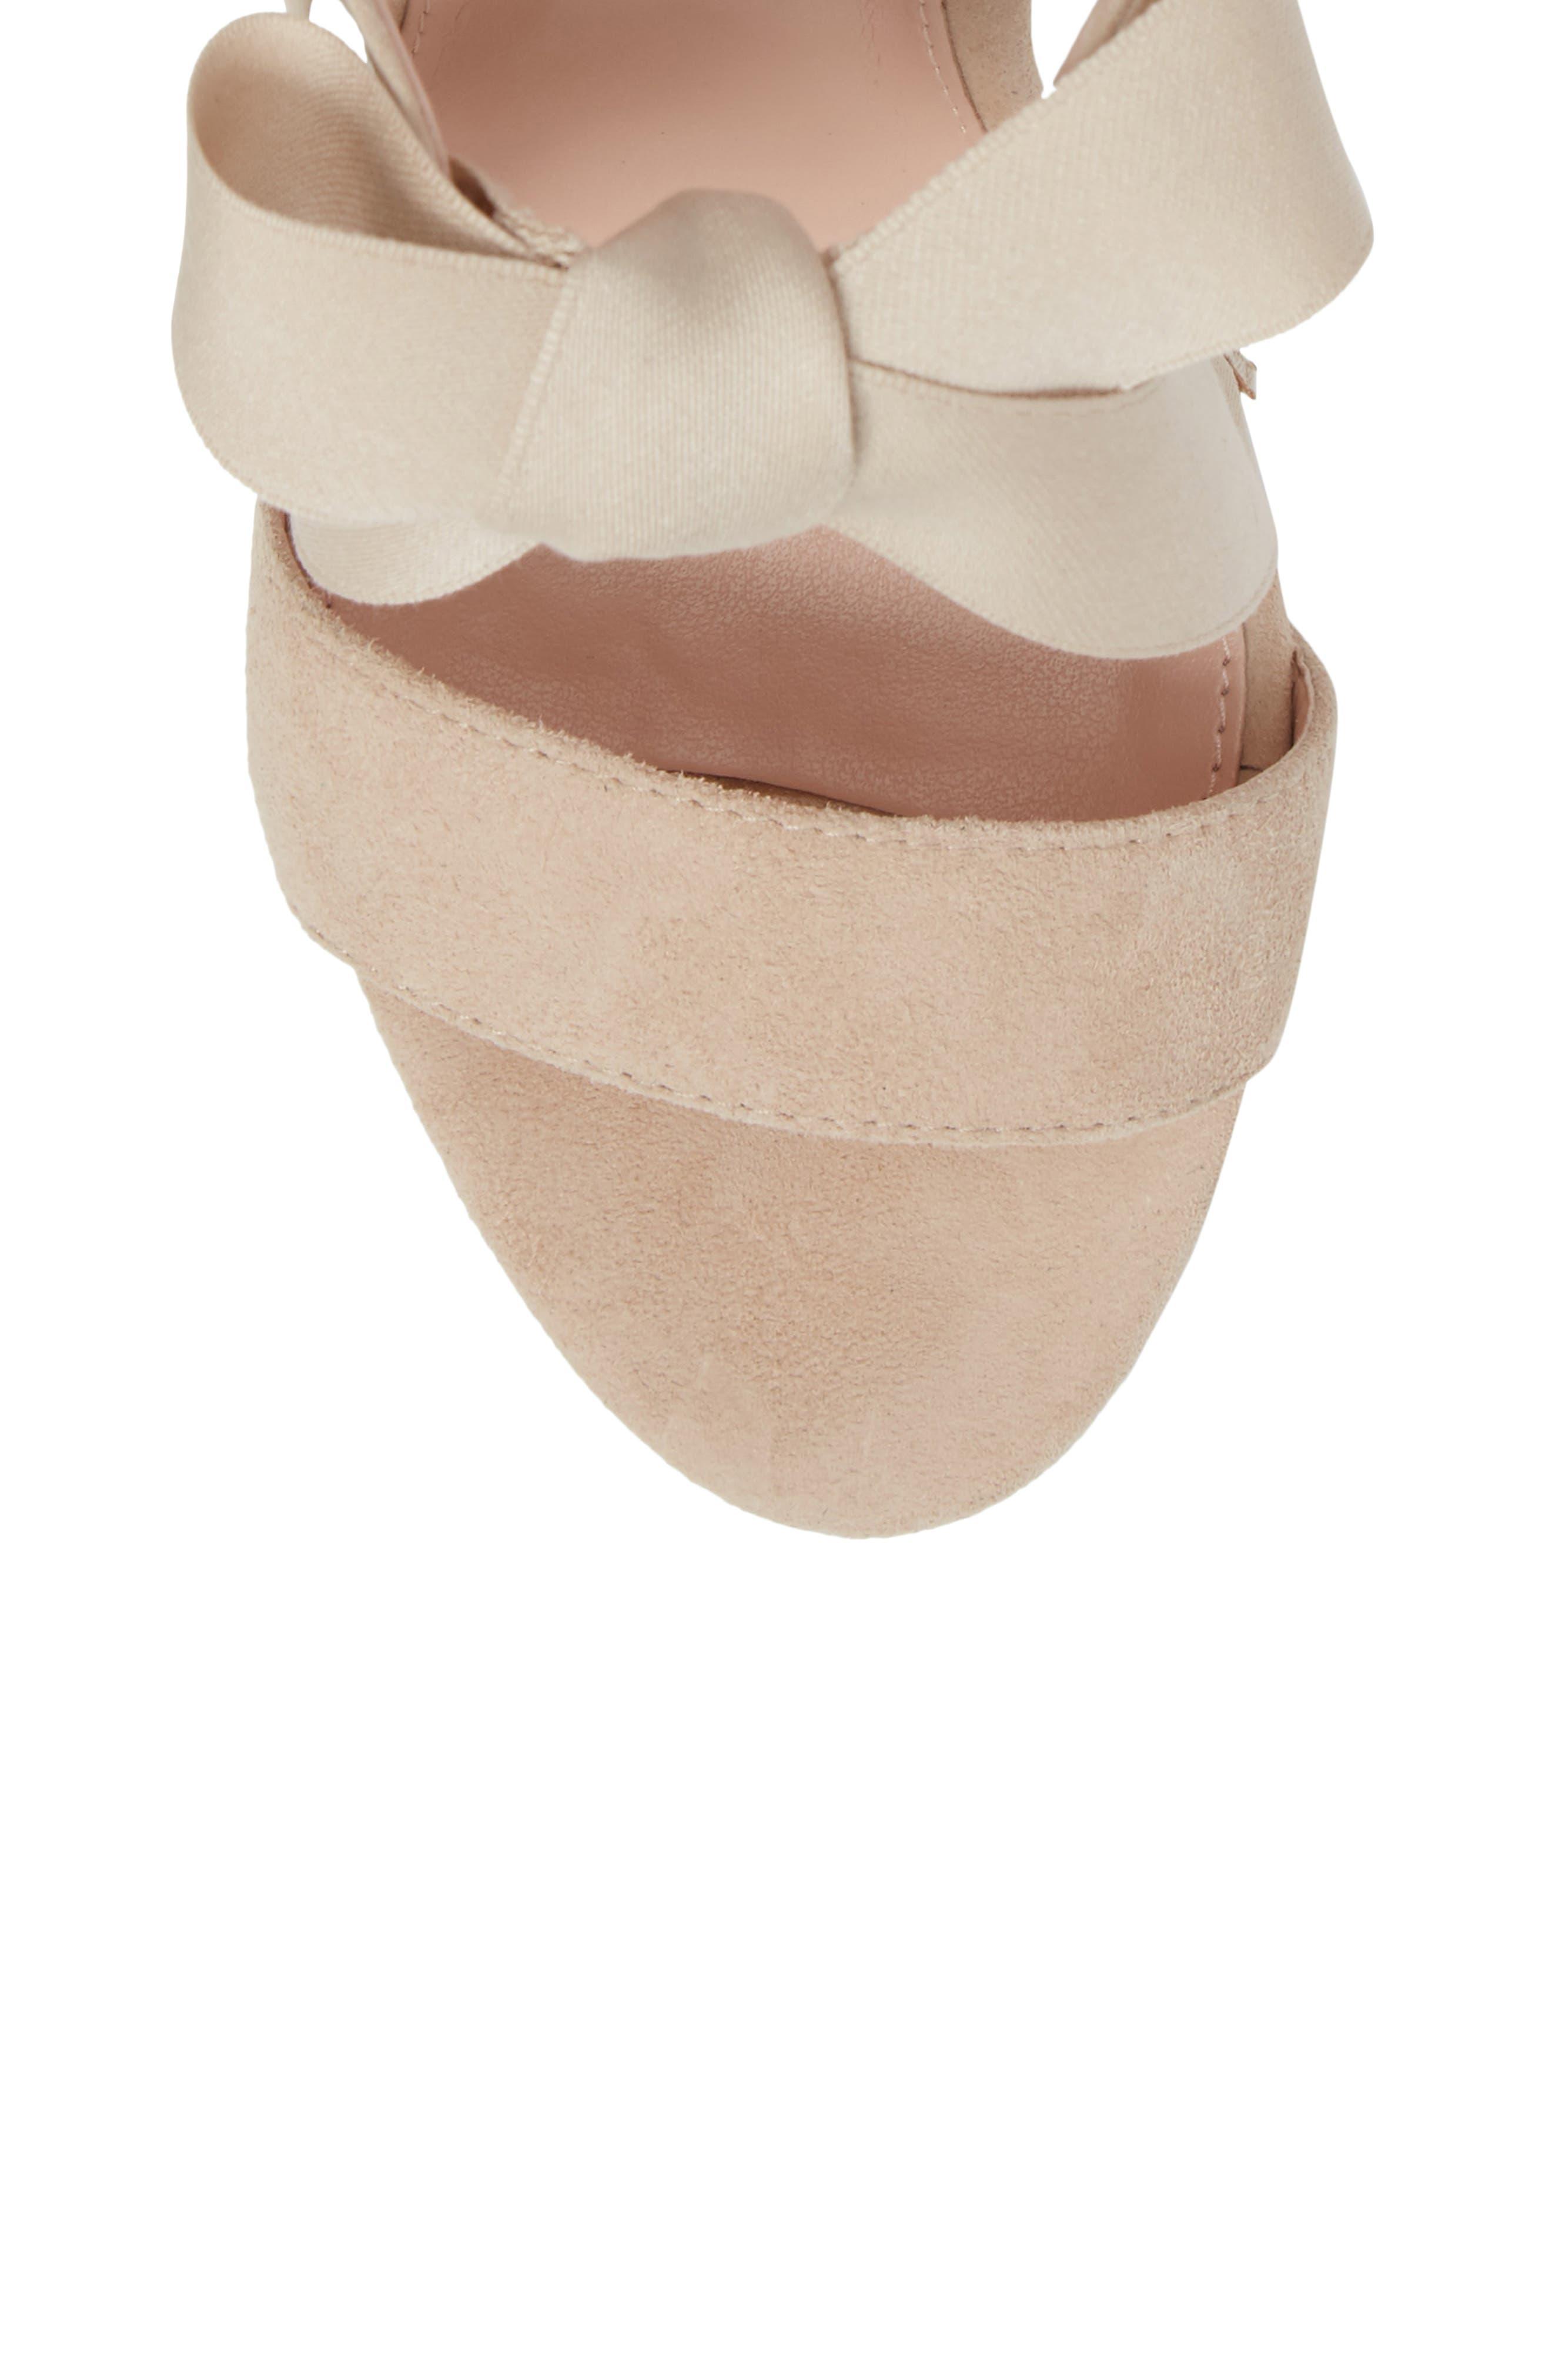 Megan Tie Strap Sandal,                             Alternate thumbnail 10, color,